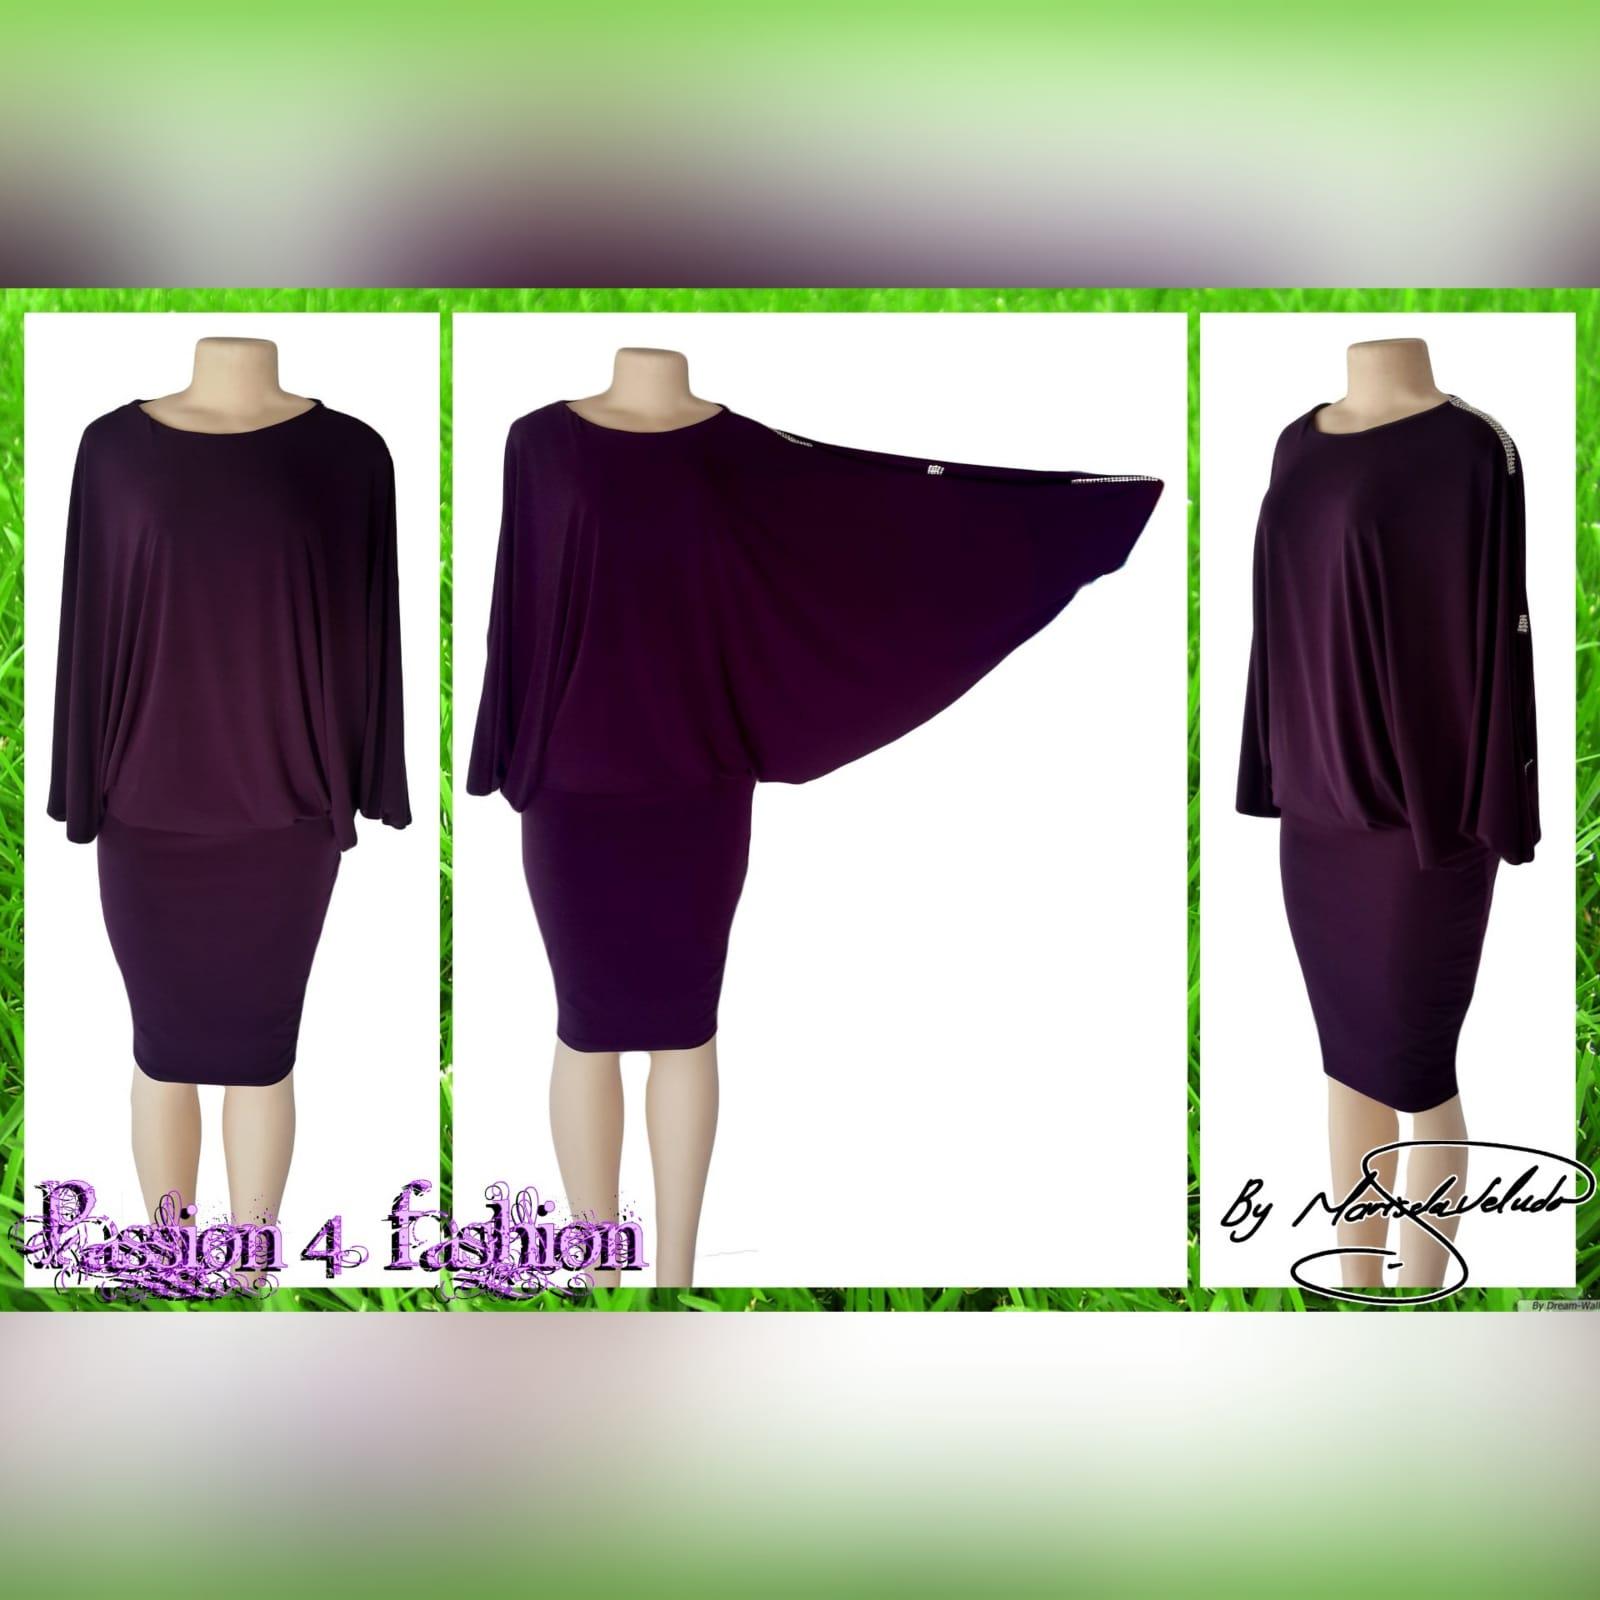 Plum smart casual knee length dress 2 plum smart casual knee length dress with wide sleeves and fitted hip area creating a mini skirt look